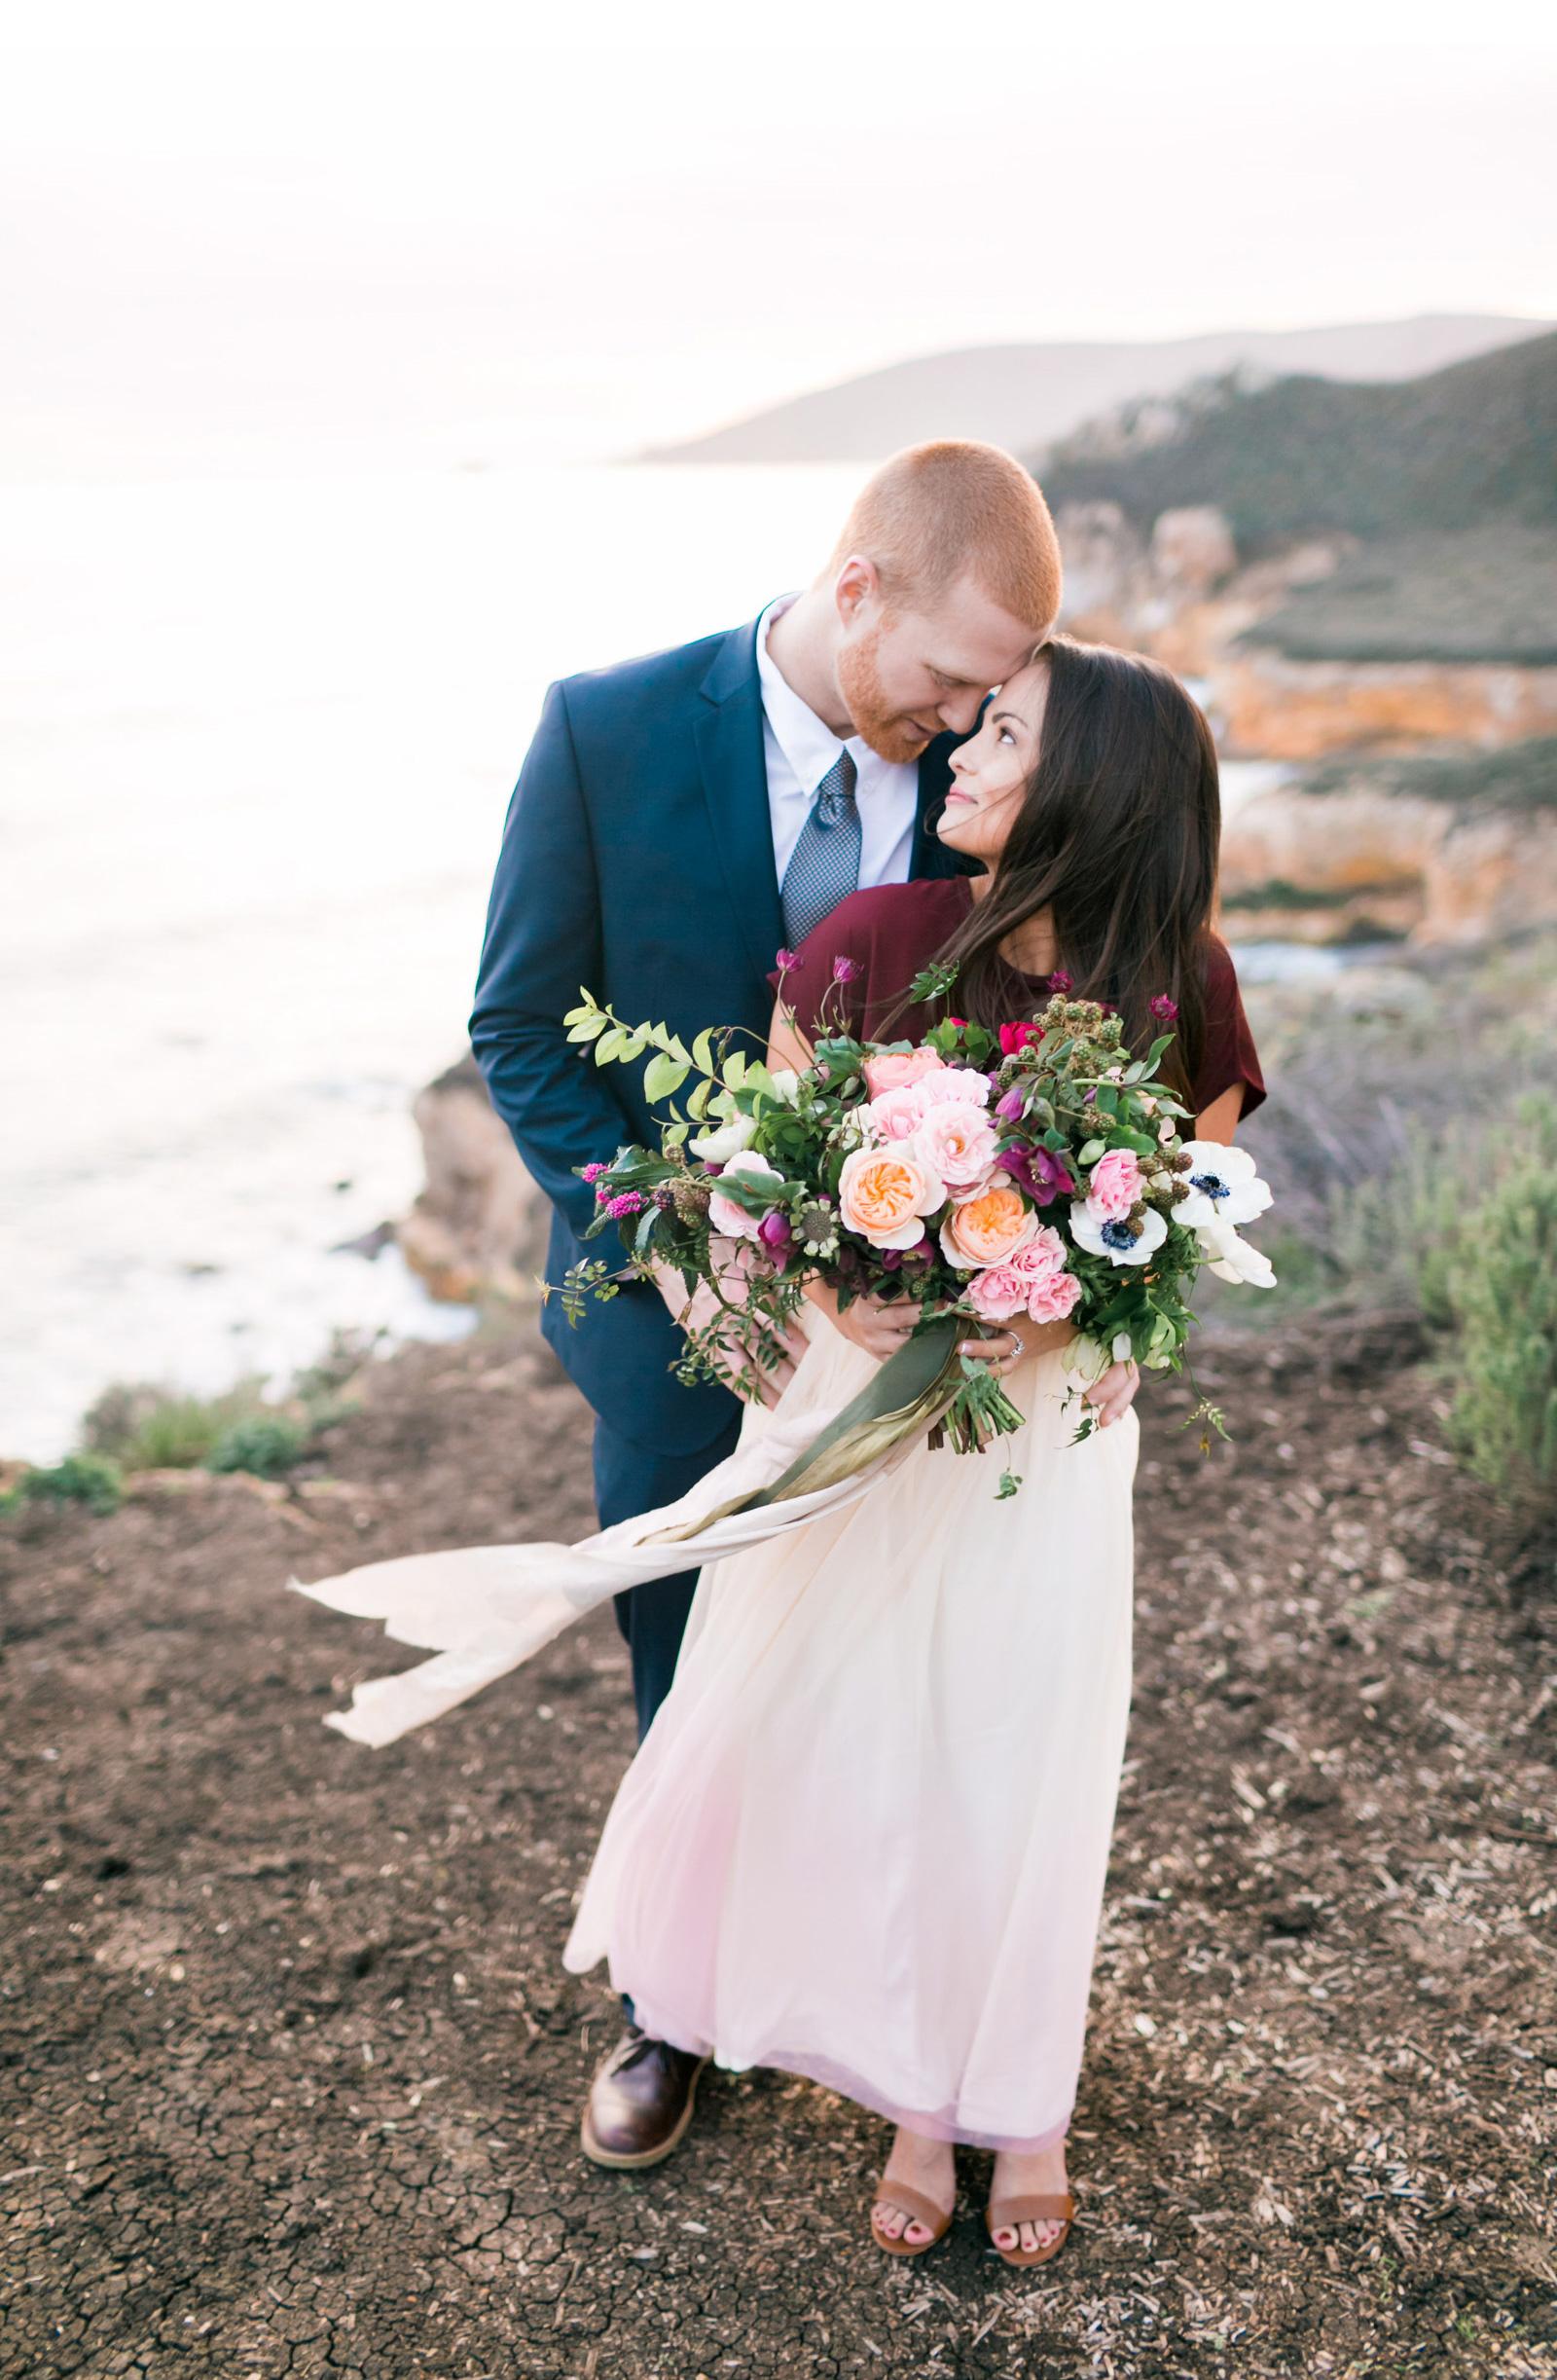 Southern_California_Wedding_Photographer_Natalie_Schutt_Photography_03.jpg